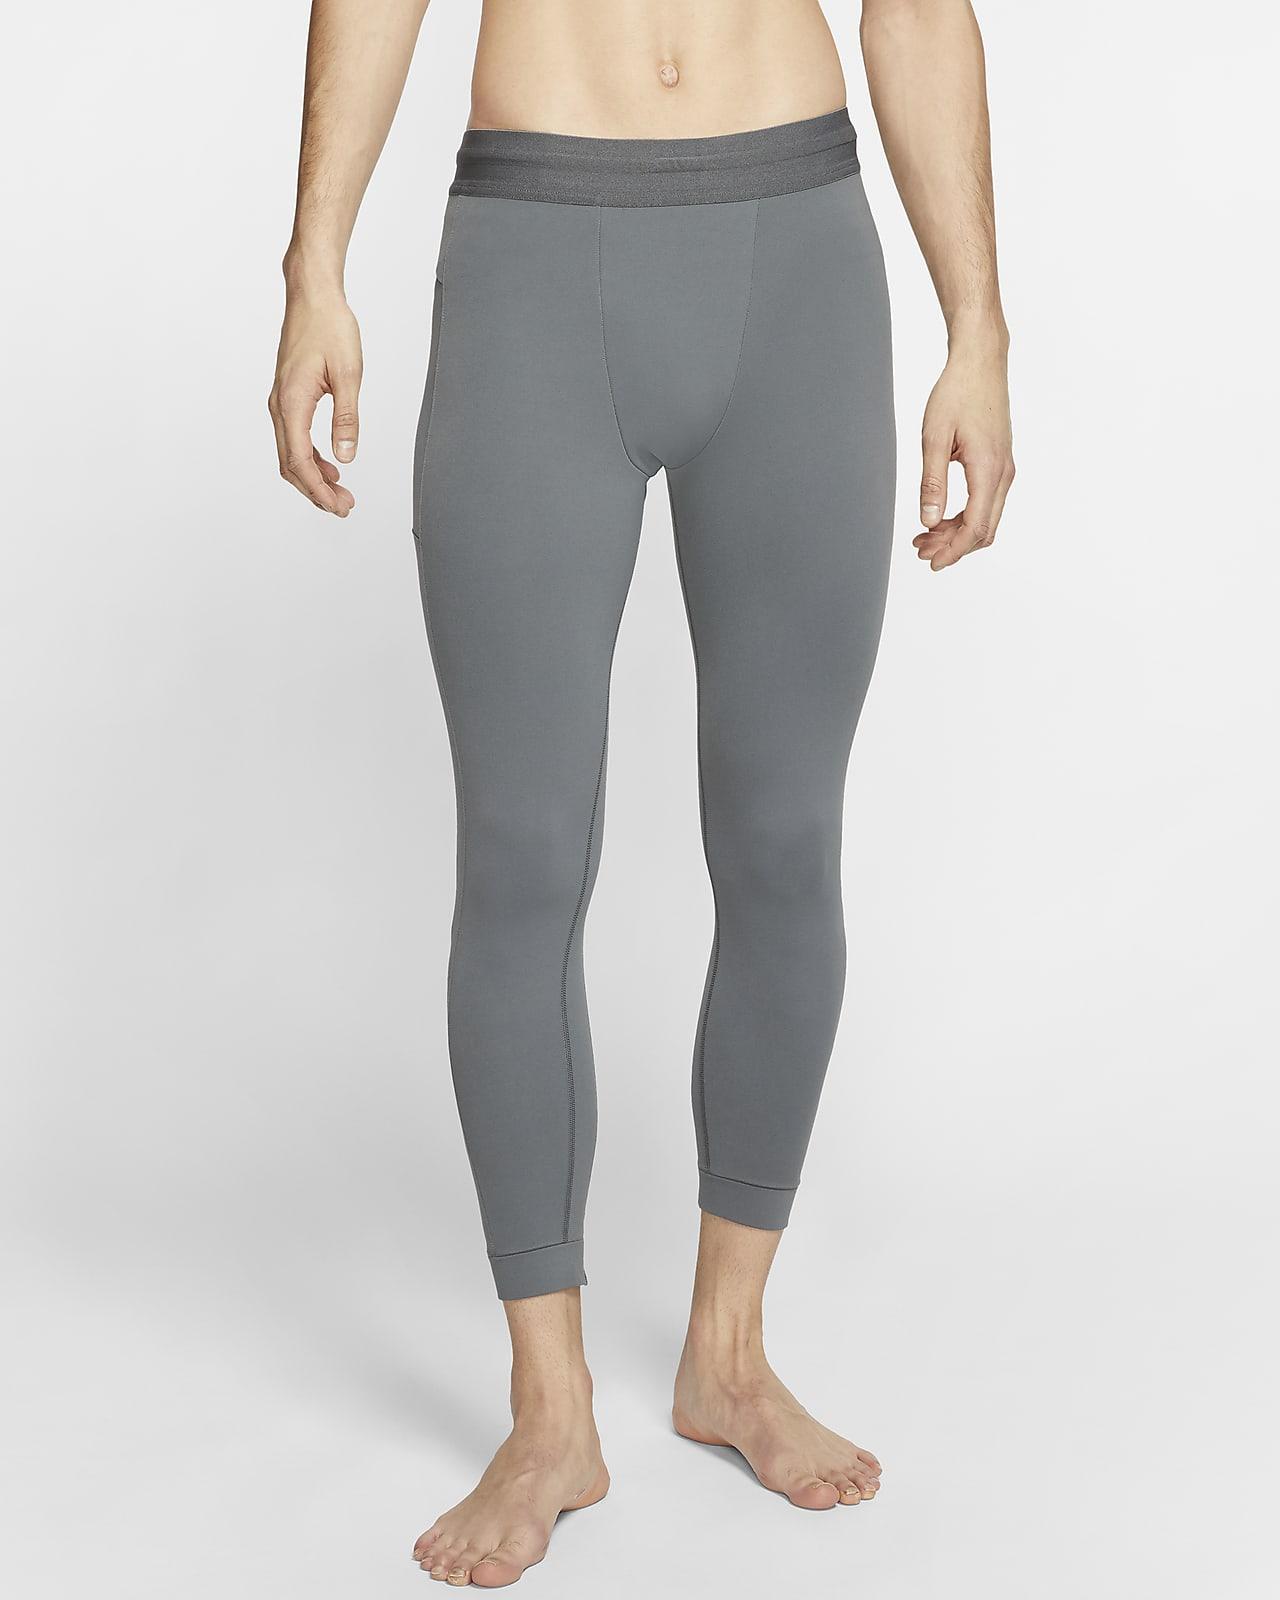 Tights Infinalon a 3/4 Nike Yoga Dri-FIT - Uomo